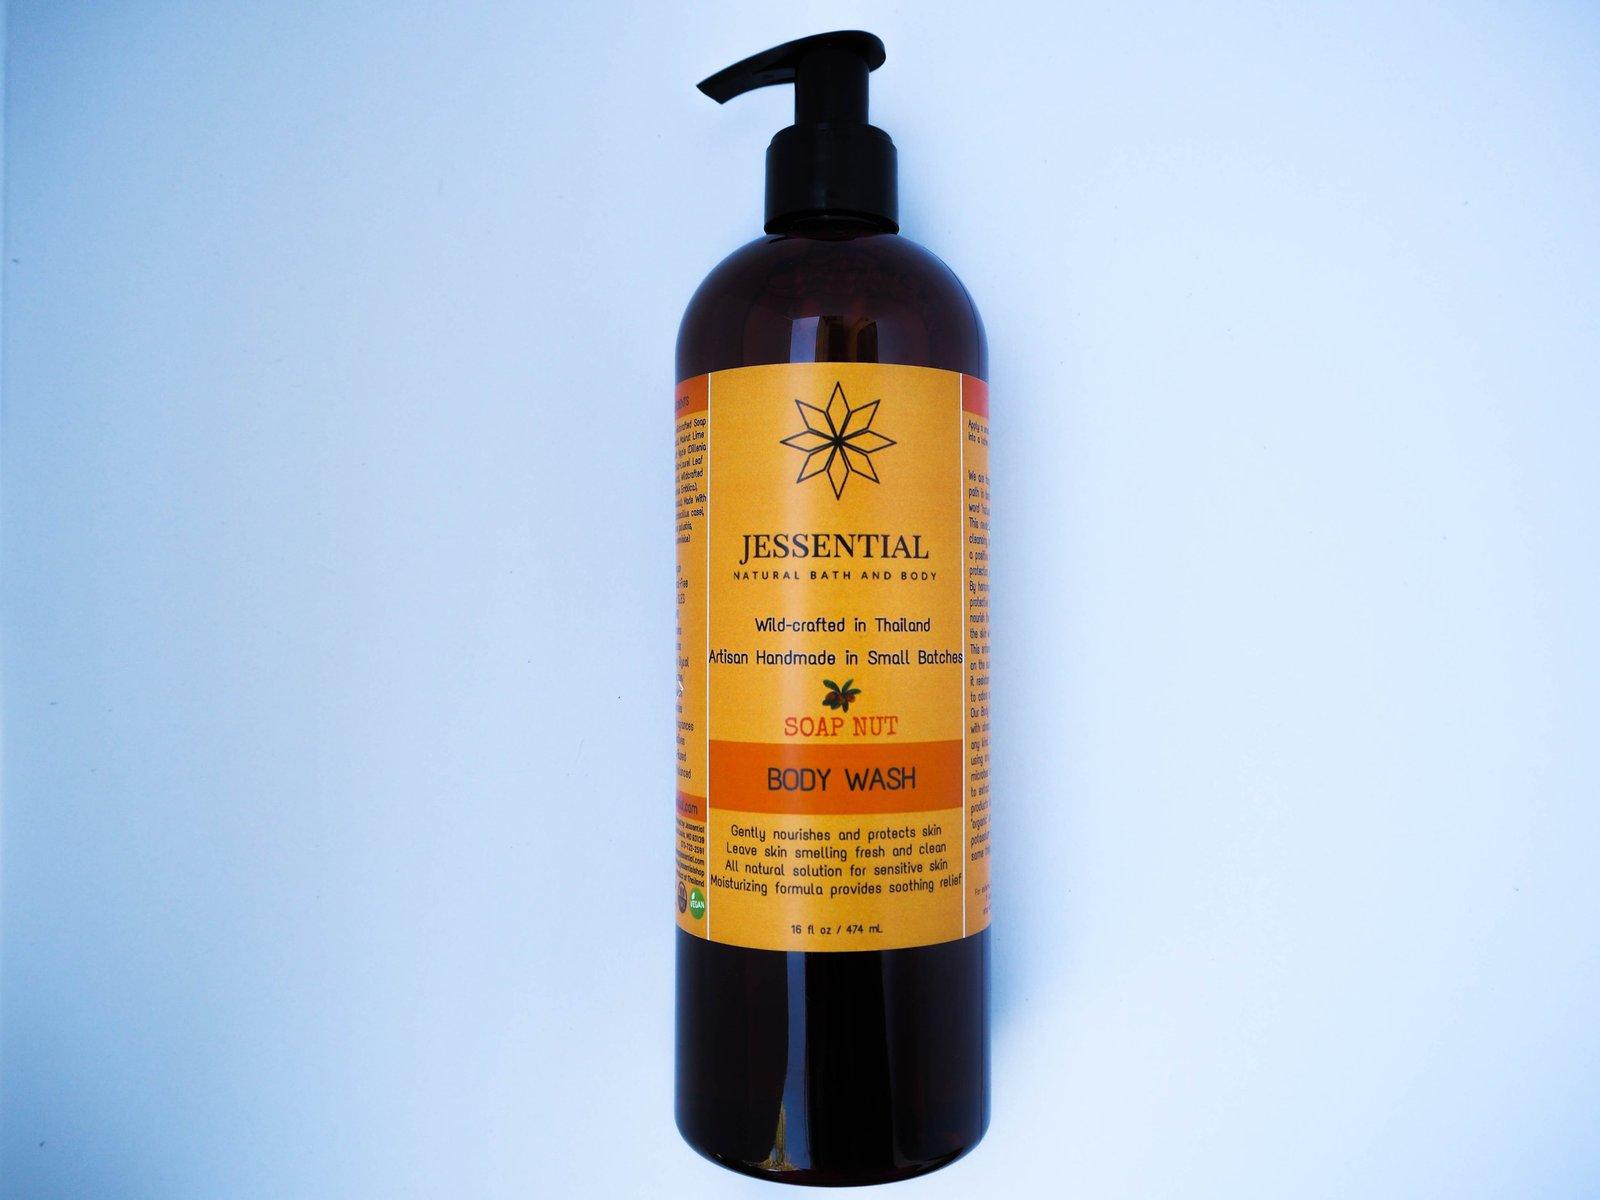 16oz 3 set Shampoo Body Wash Conditioner Vegan For All Hair Types